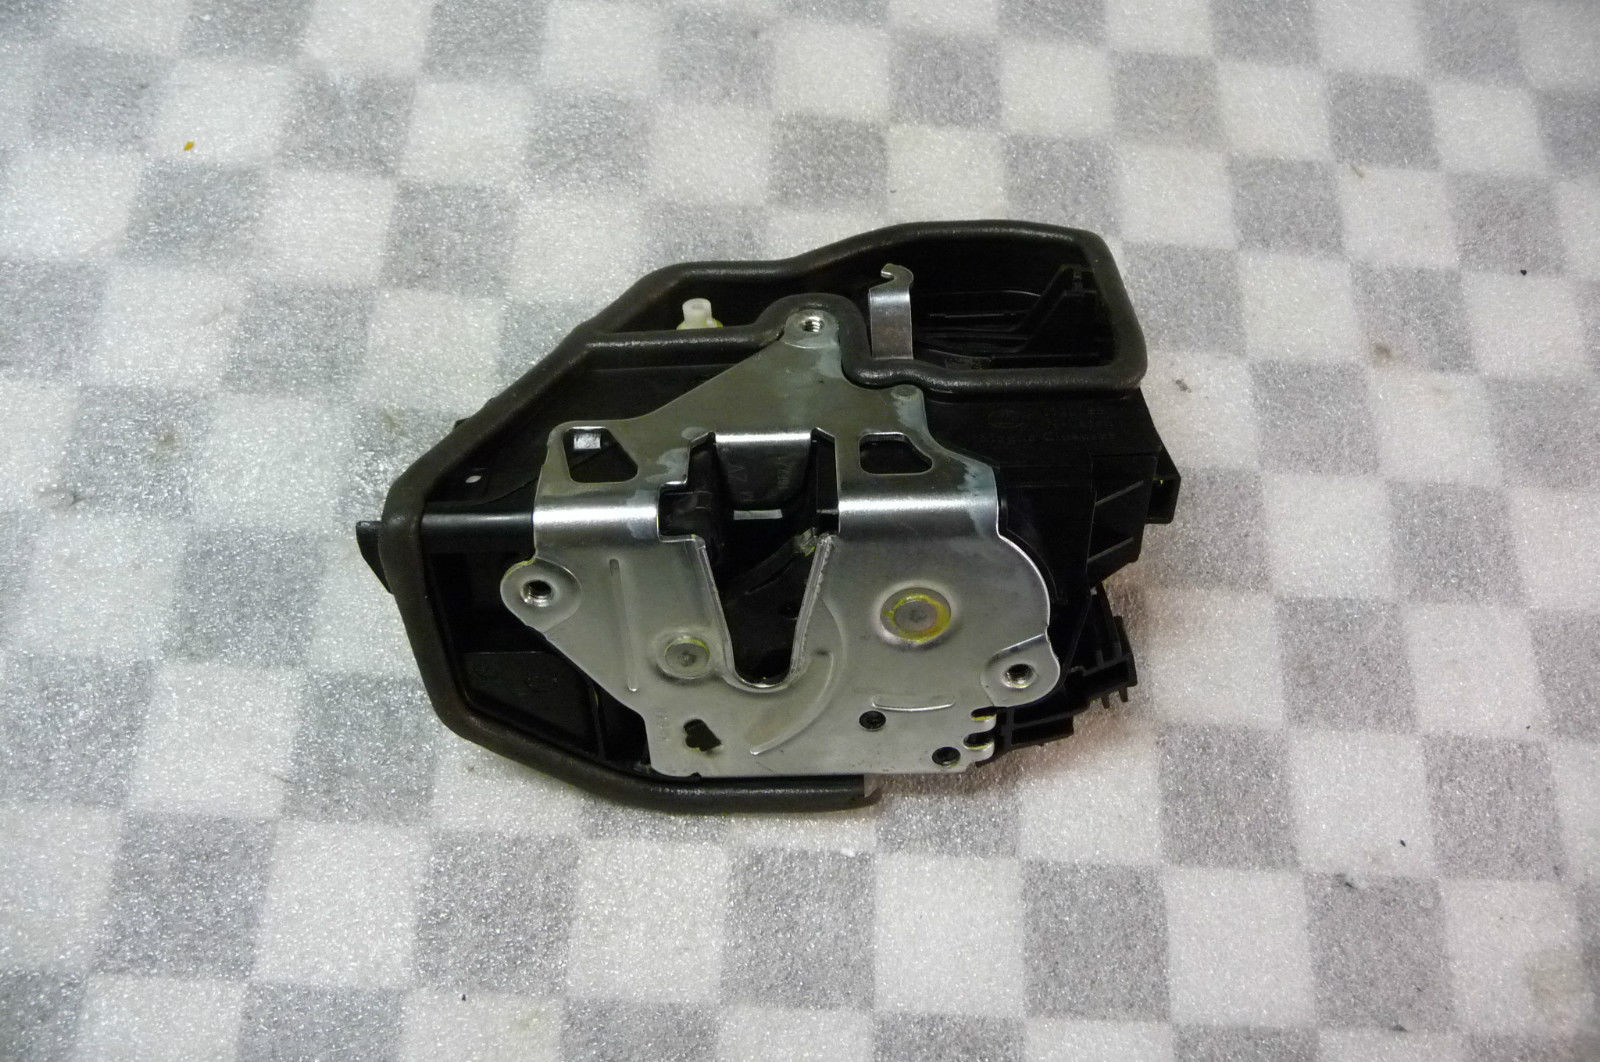 BMW X3 X5 X6 Front Left Door Lock Locking System Latch 51217318419 OEM OE